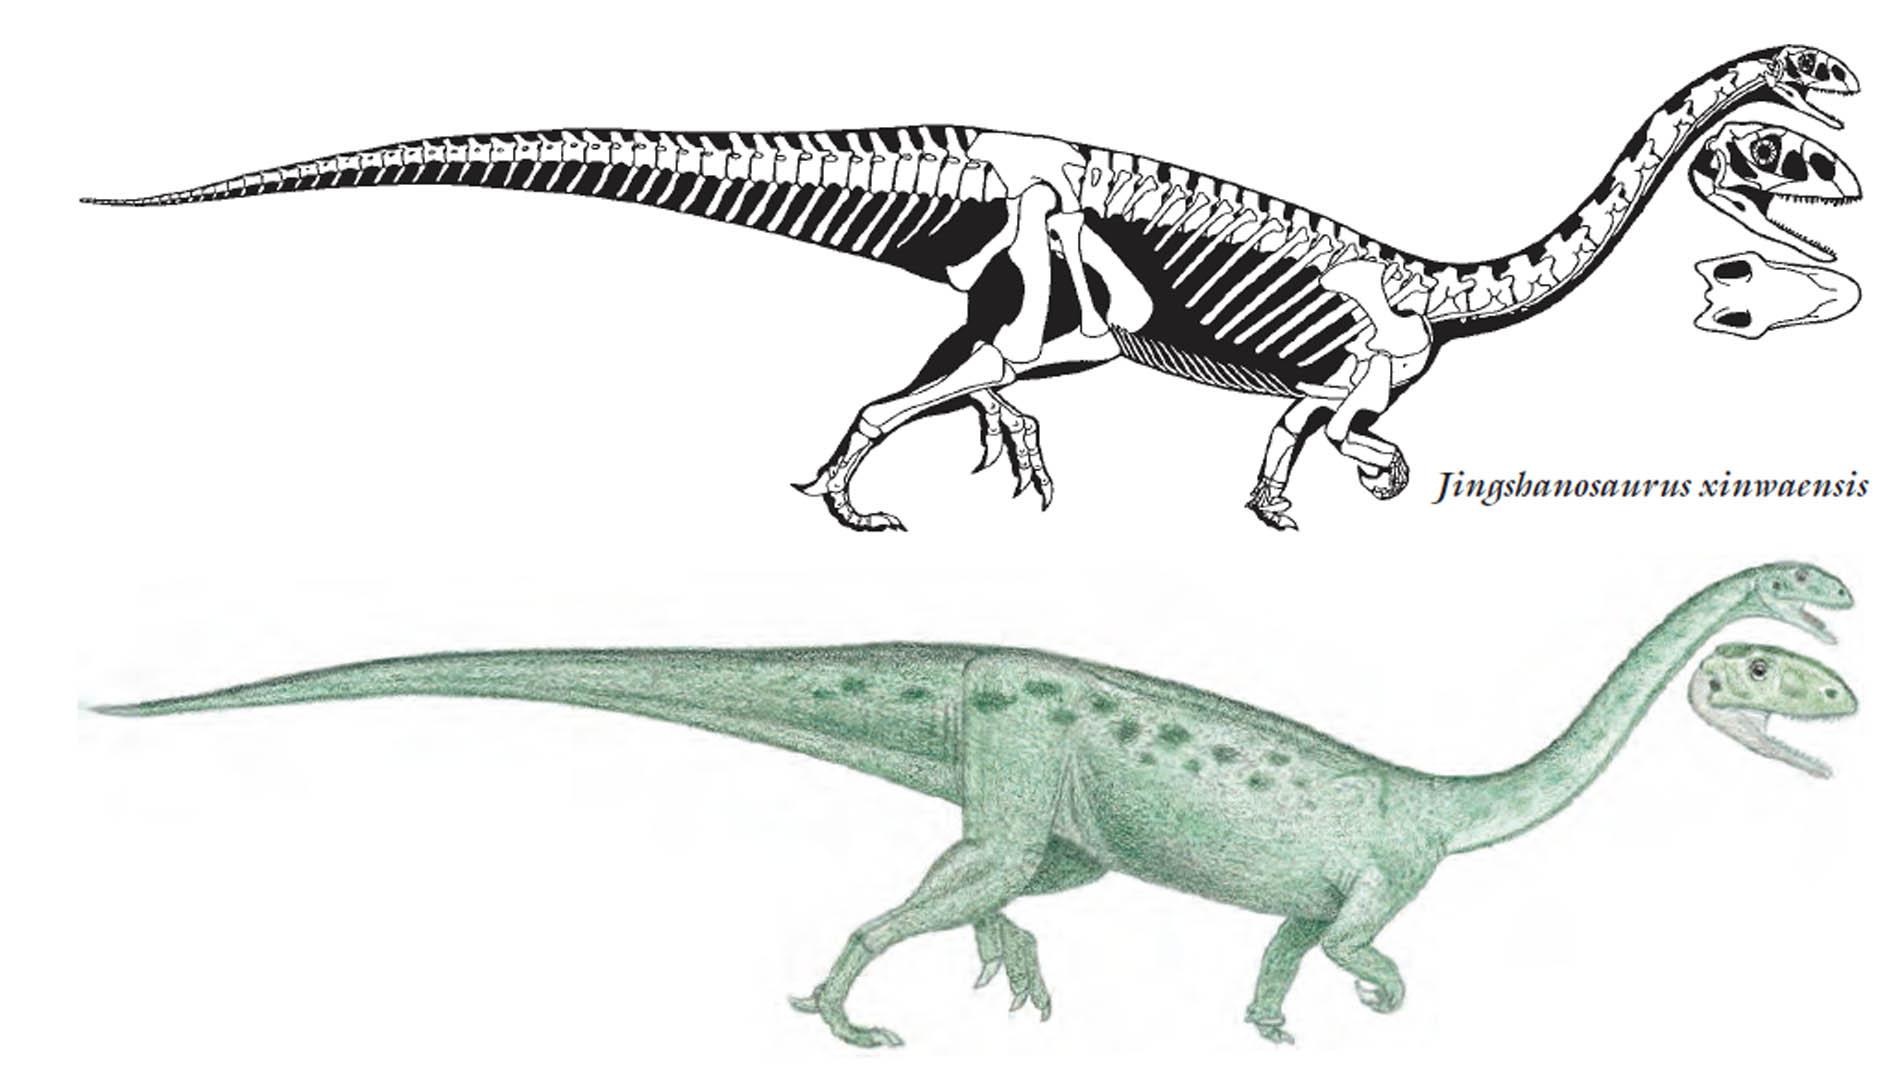 Jingshanosaurus herbivore dinosaurs wallpaper image